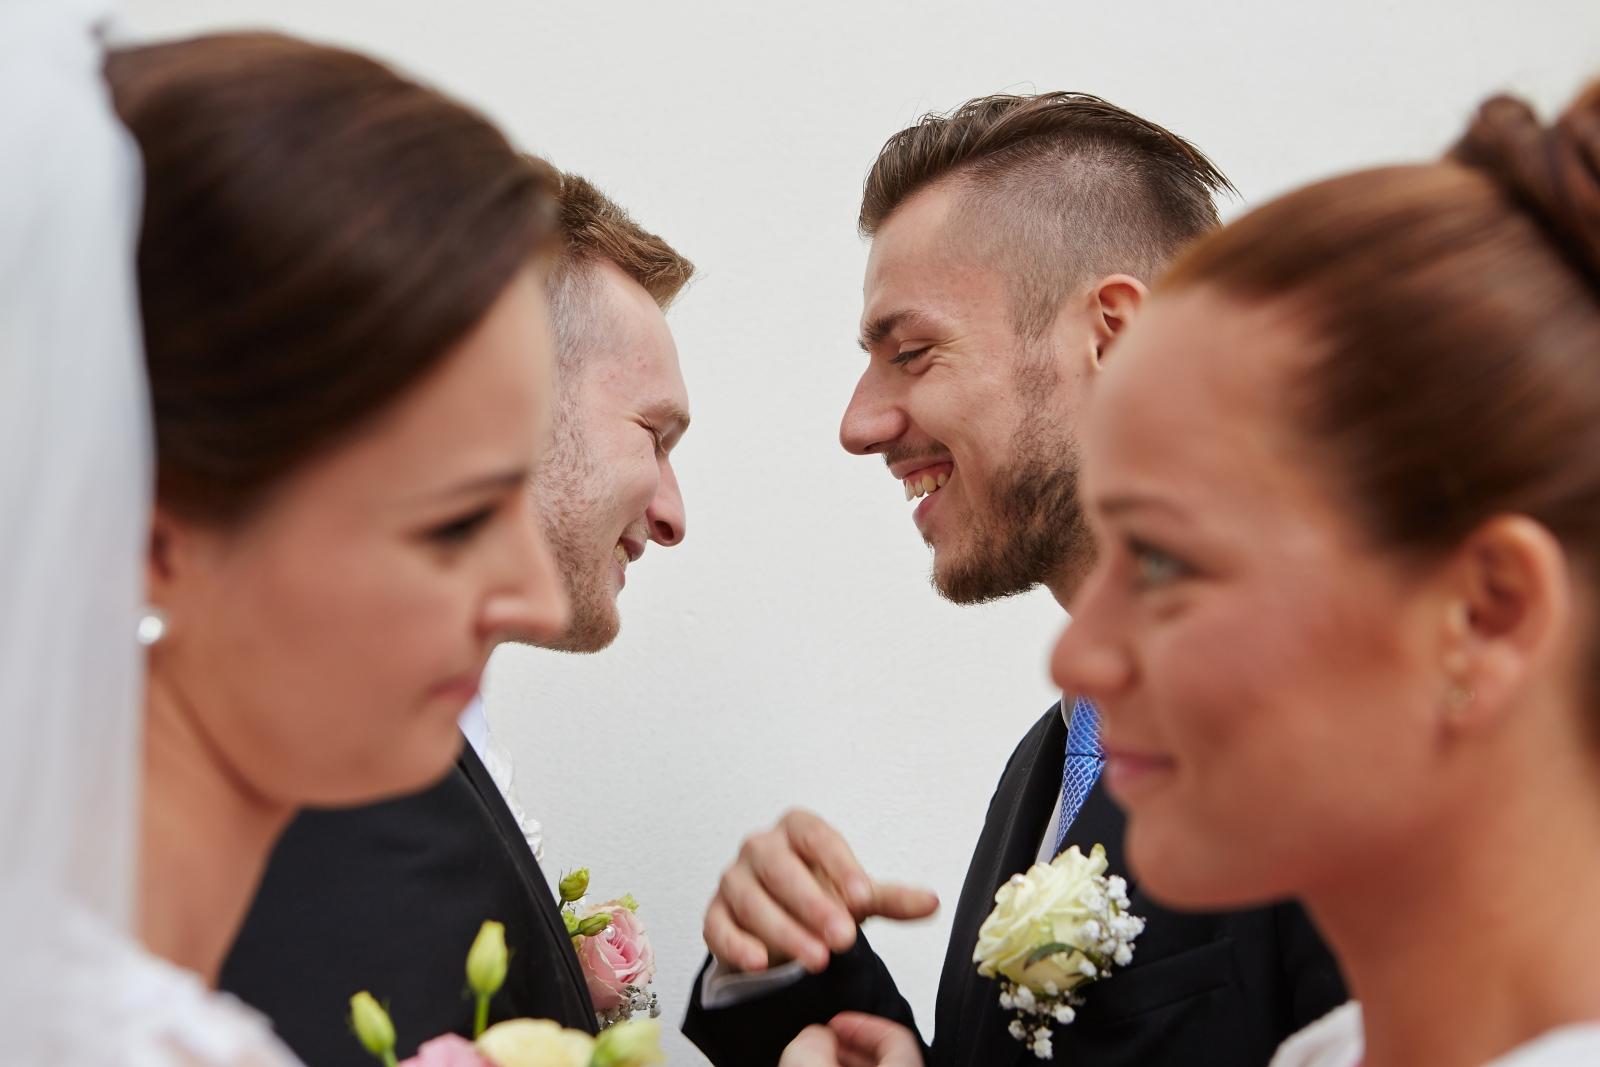 Svadba M+M - Obrázok č. 39